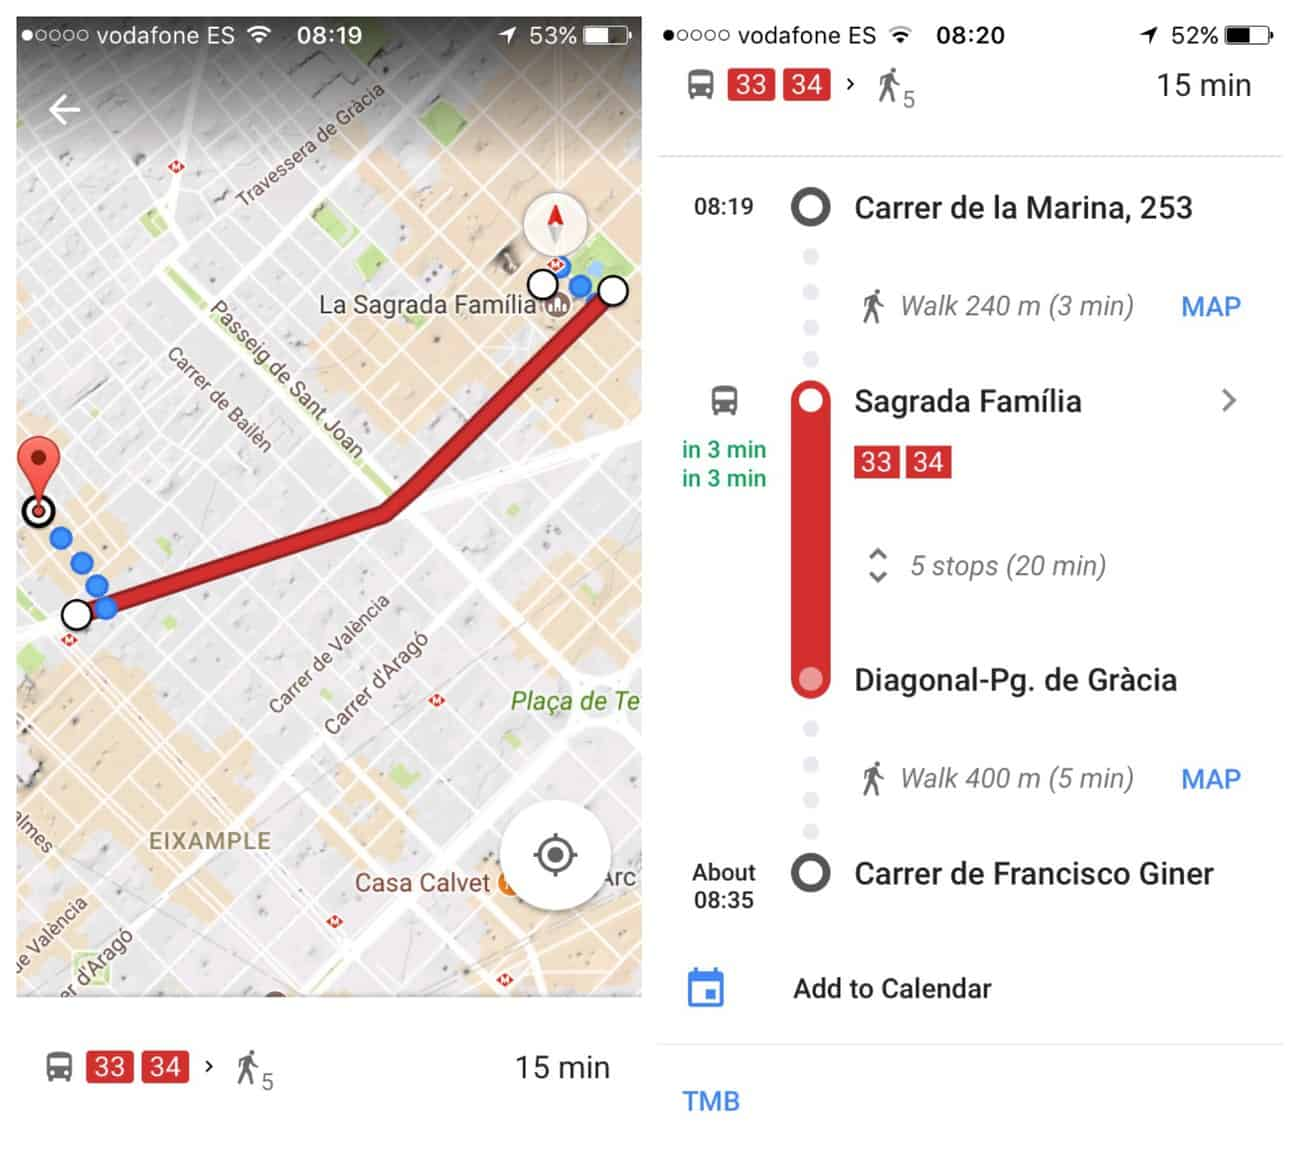 Barcelona - Google maps directions